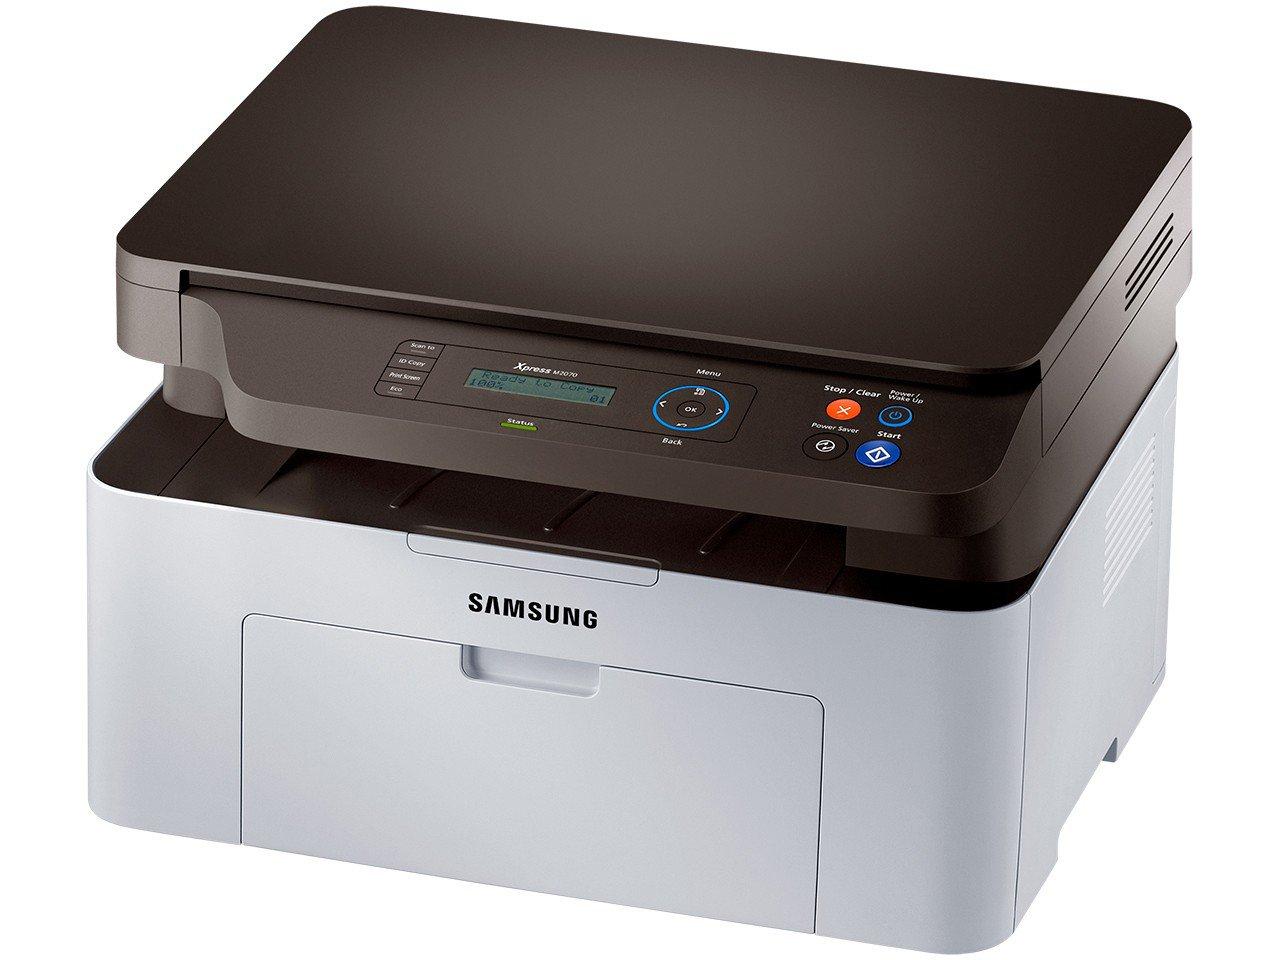 Foto 1 - Multifuncional Samsung Xpress M2070 - Monocromática Laser USB 2.0